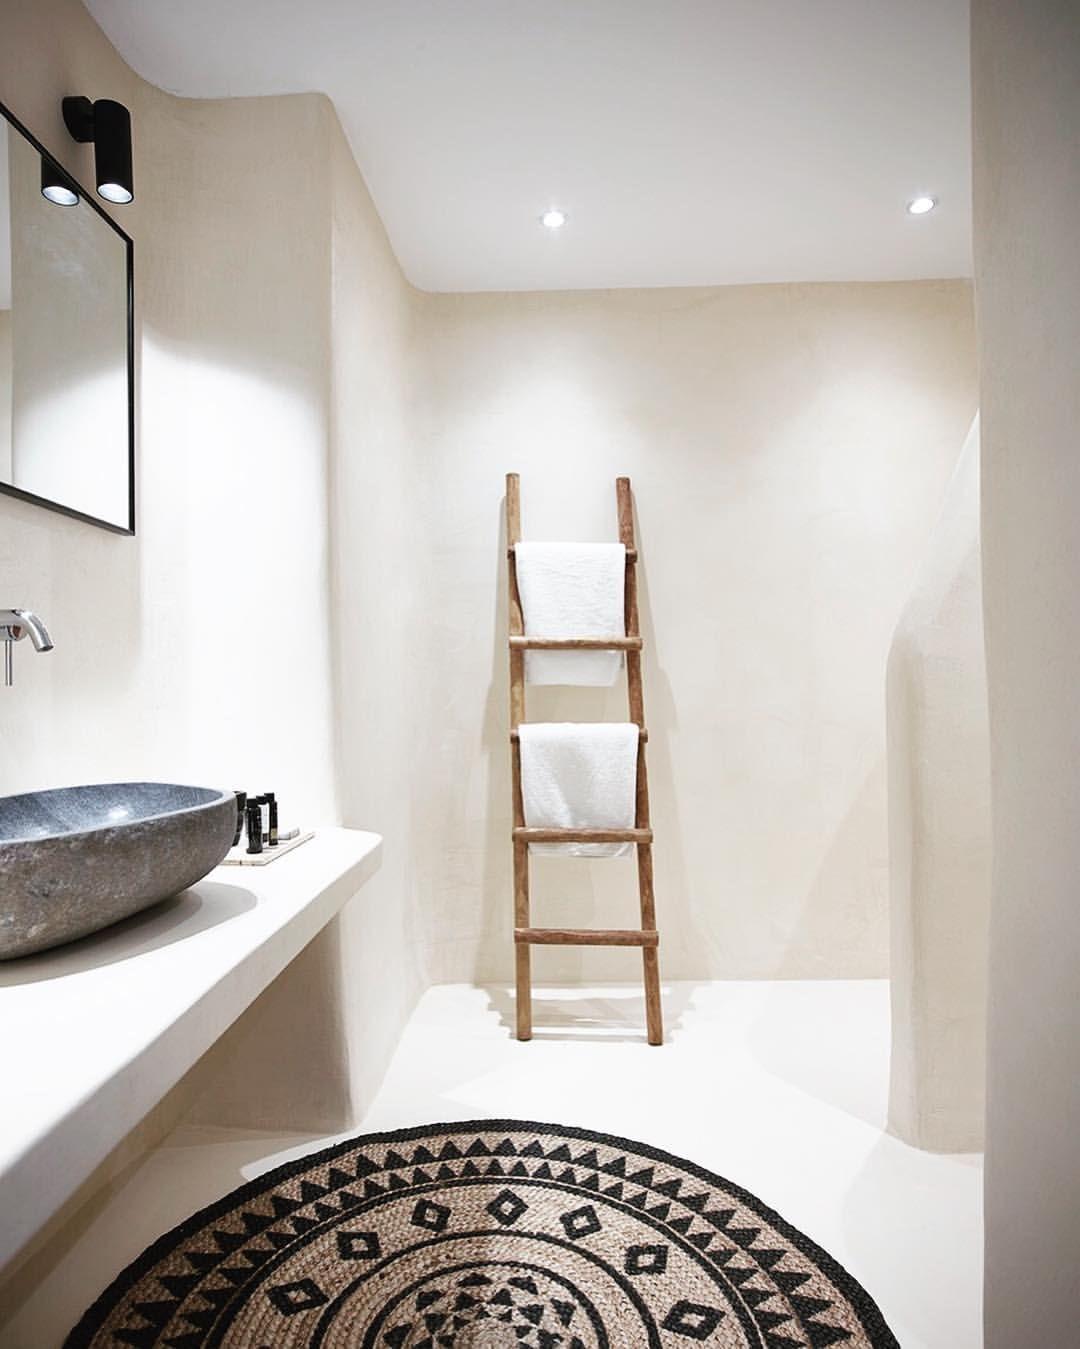 Bohemian Simplicity 〰 #hotel #bohochic #luxury #vacation